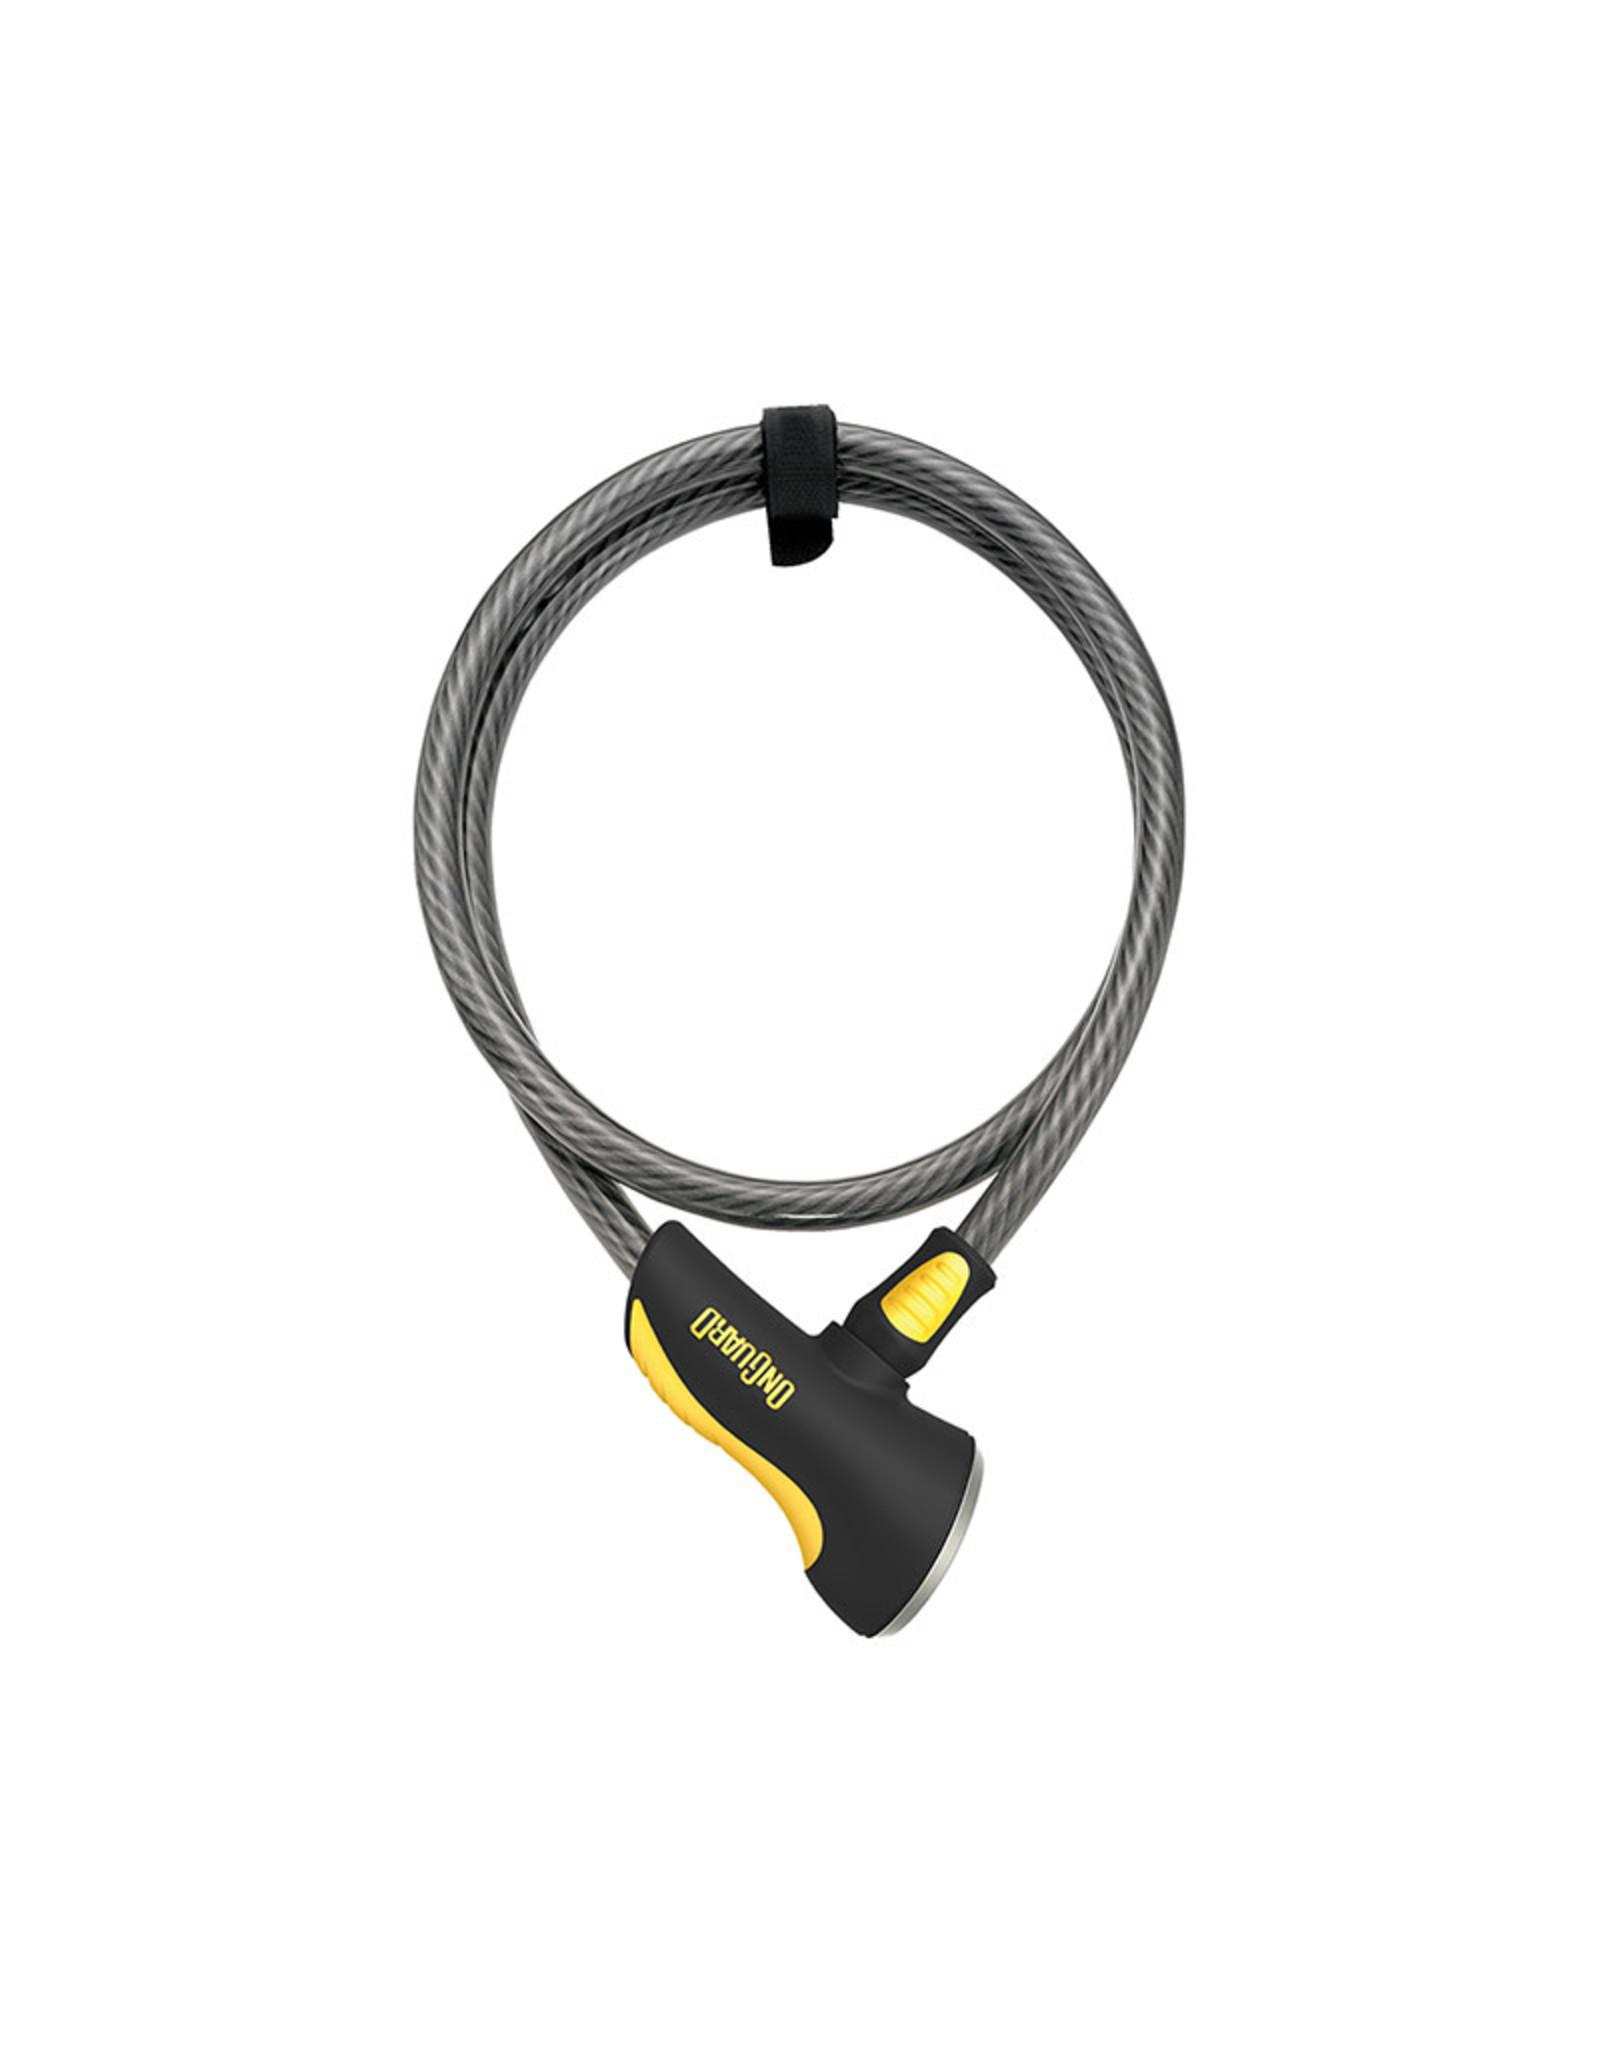 TOPEAK, ONGUARD ONGUARD CABLE LOCK AKITA 8039,-12mmX 4' KEY